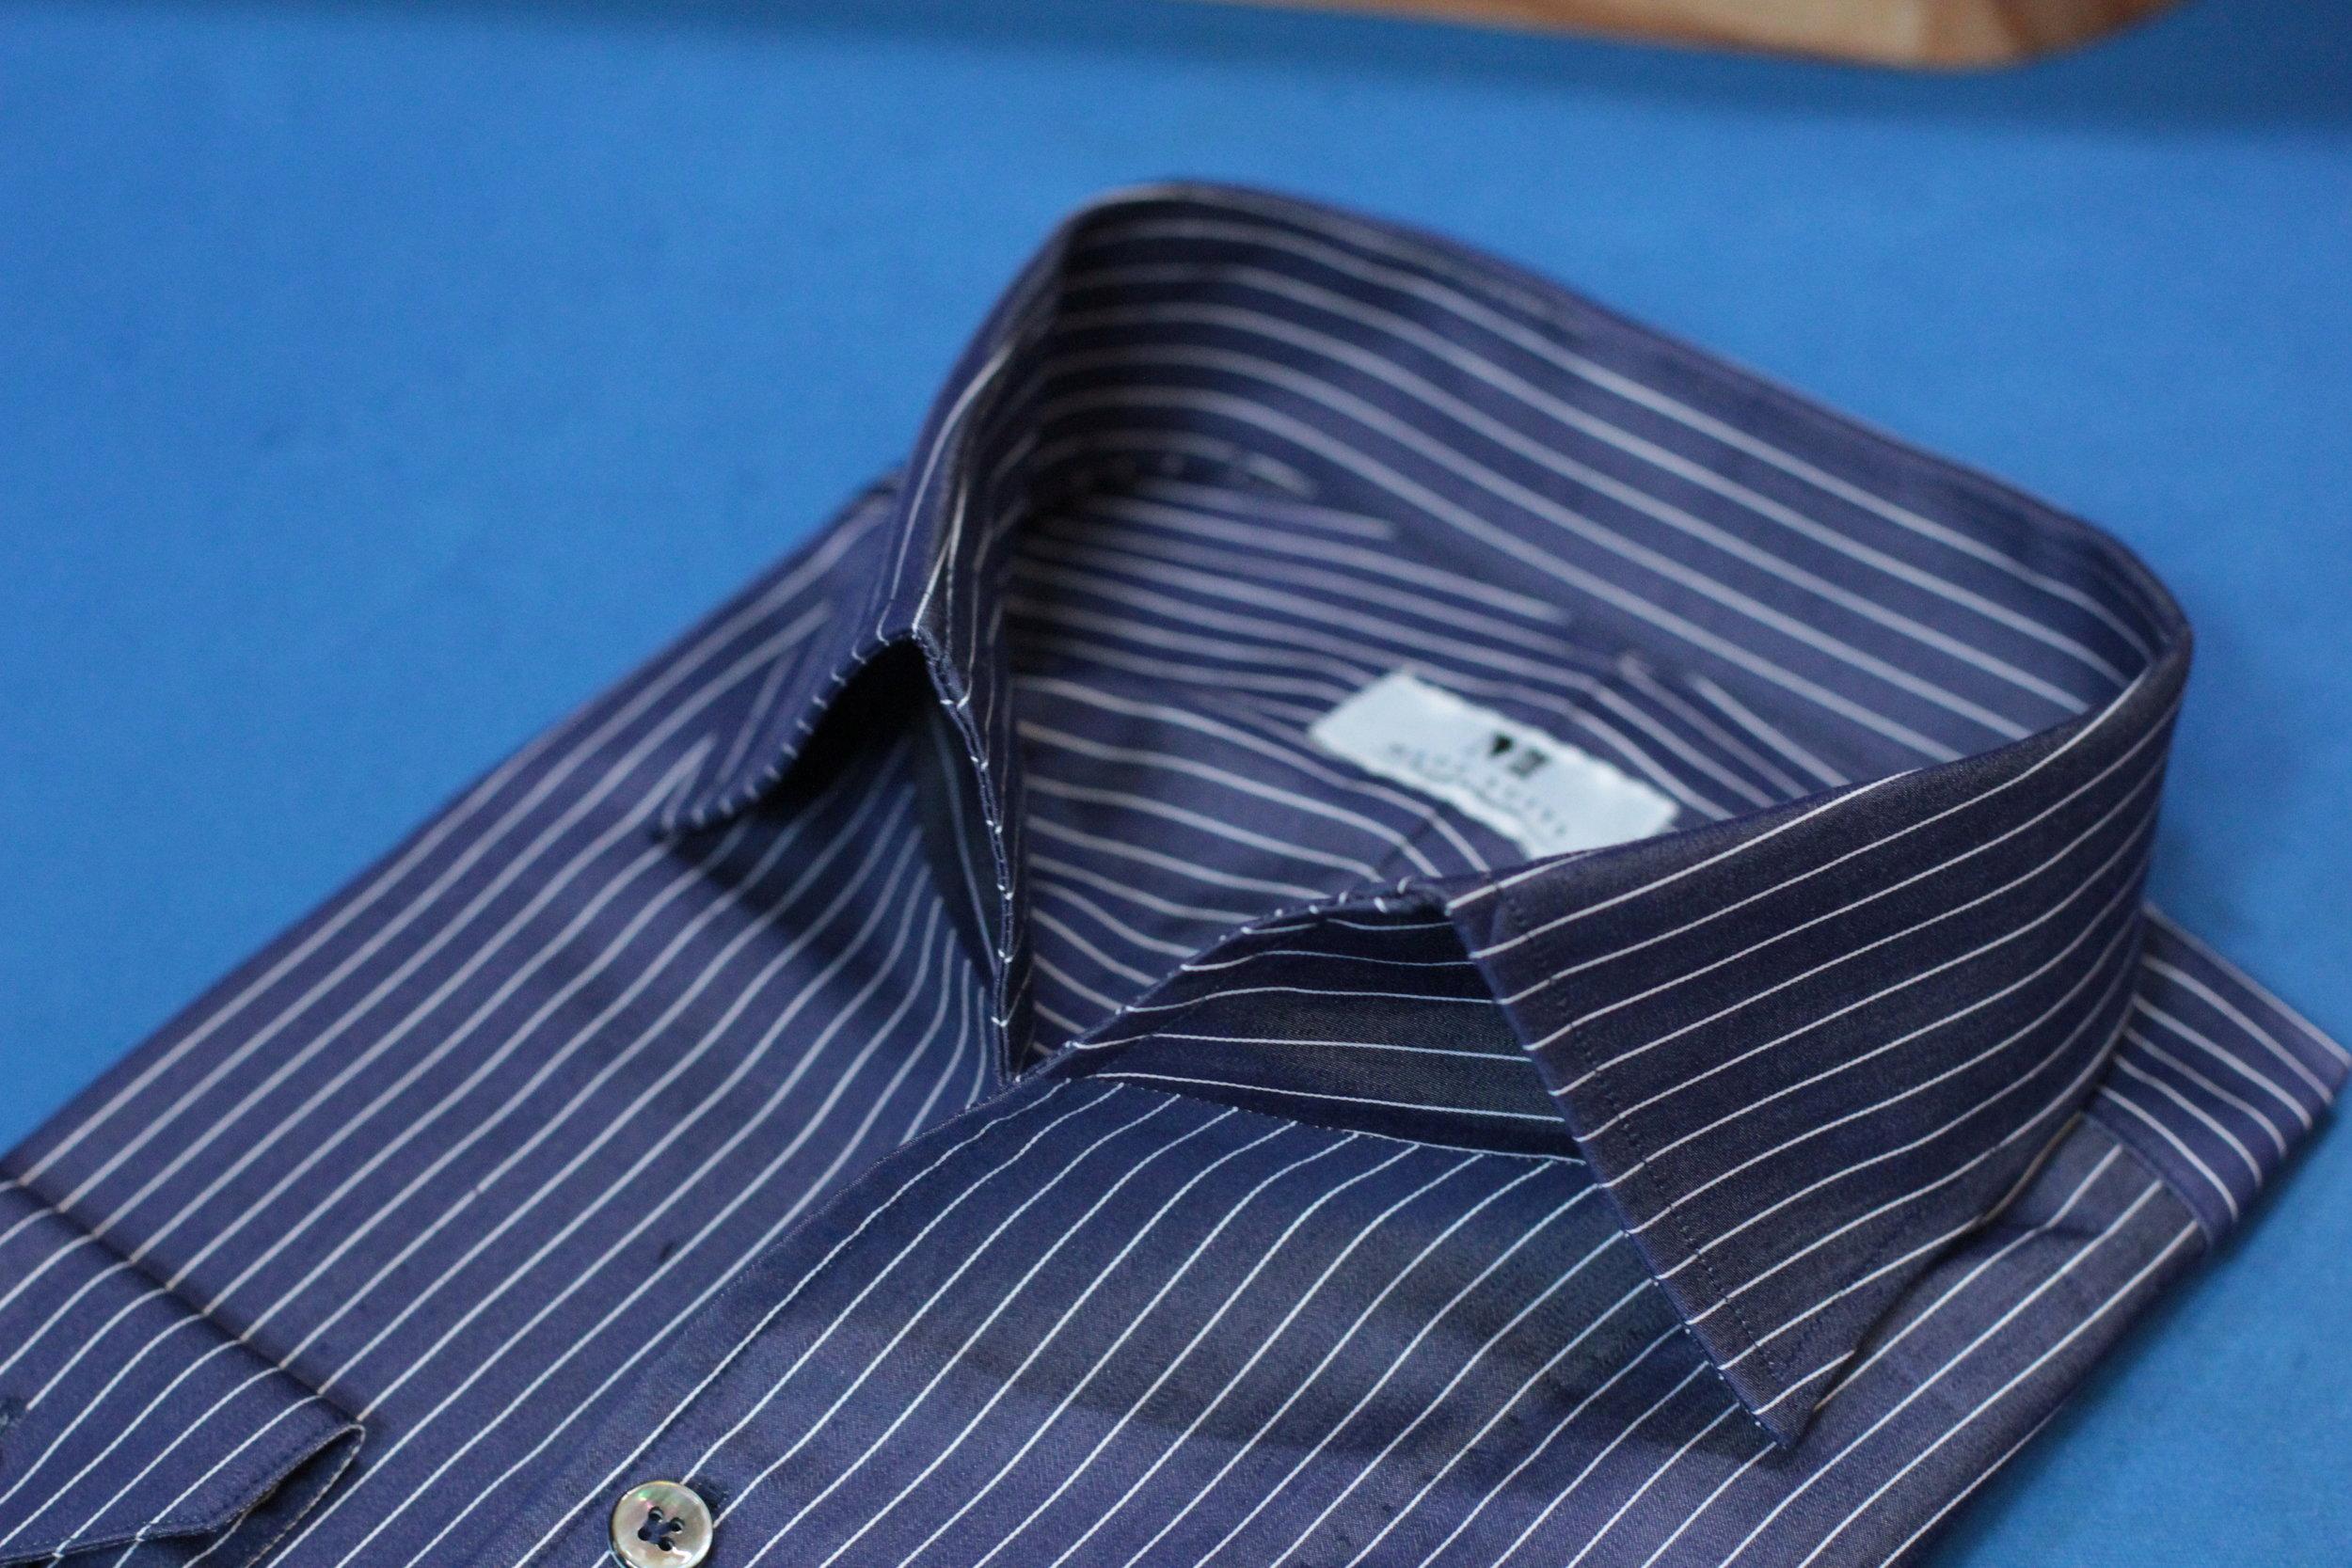 Blue STYLBIELLA | MADE SUITS One Piece Collar Bespoke Shirt Singapore.JPG